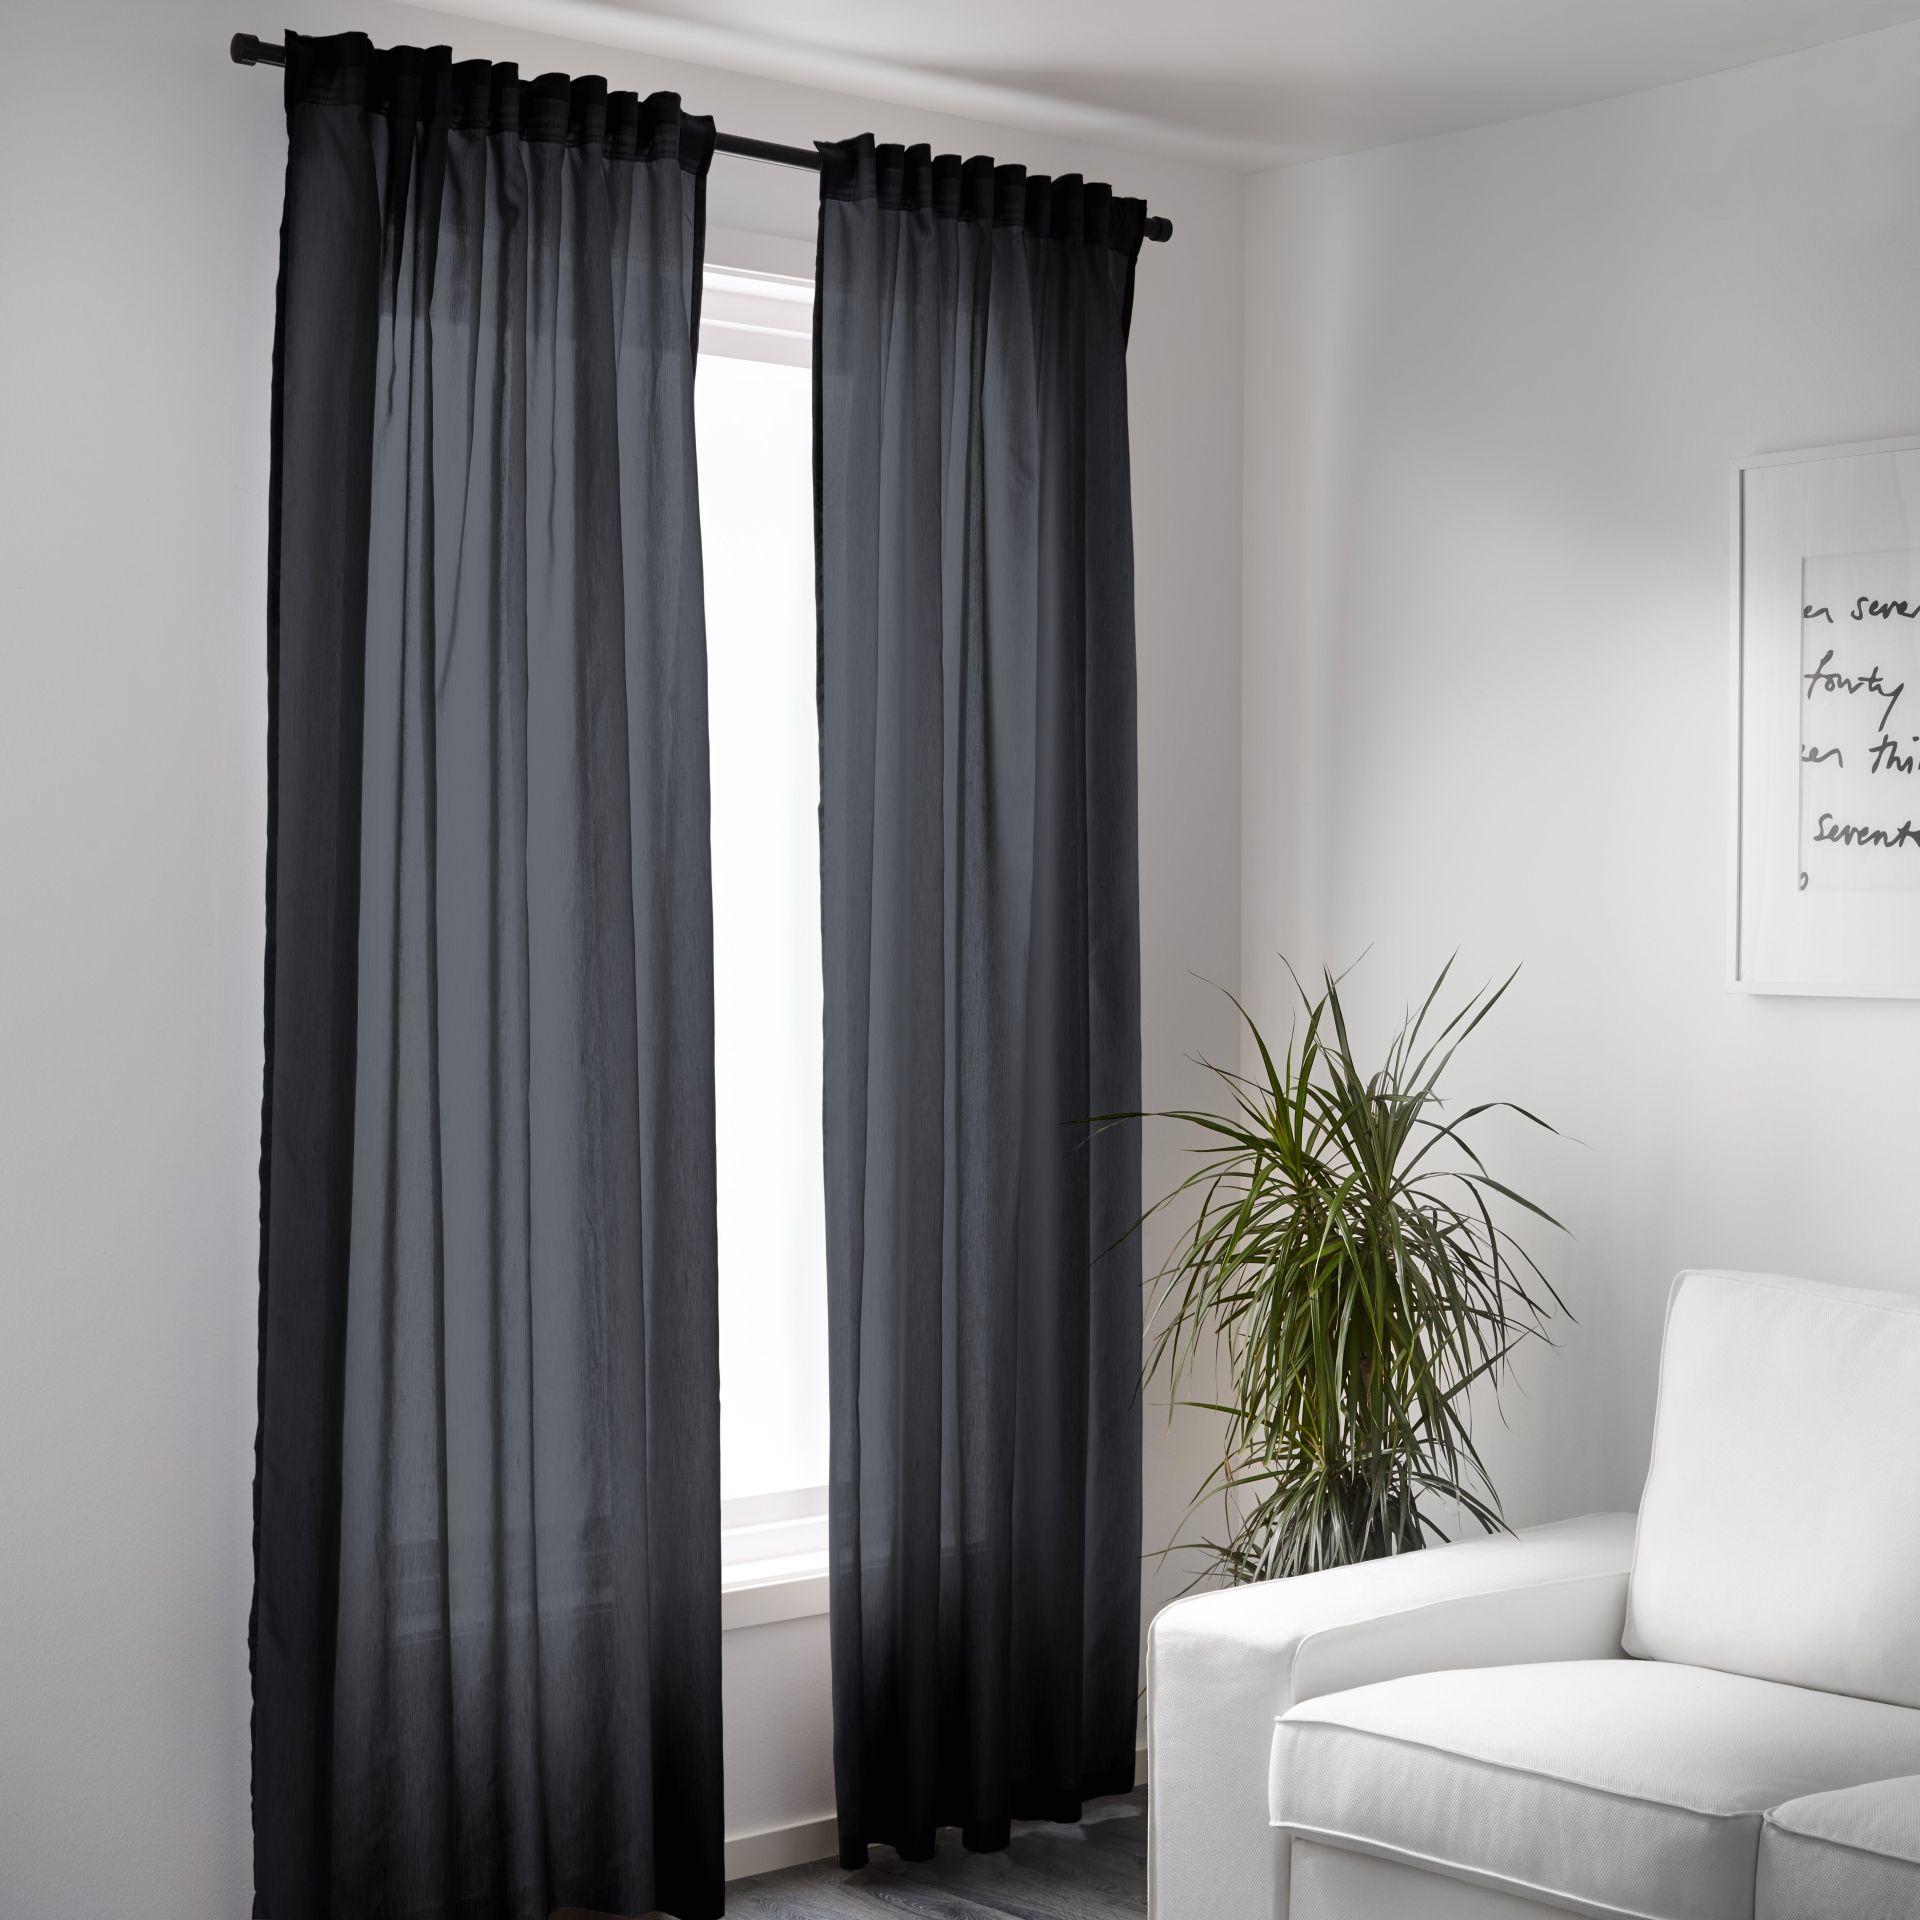 Gordijnen in stof sarah curtains and pilows t curtains for Gordijnen stof